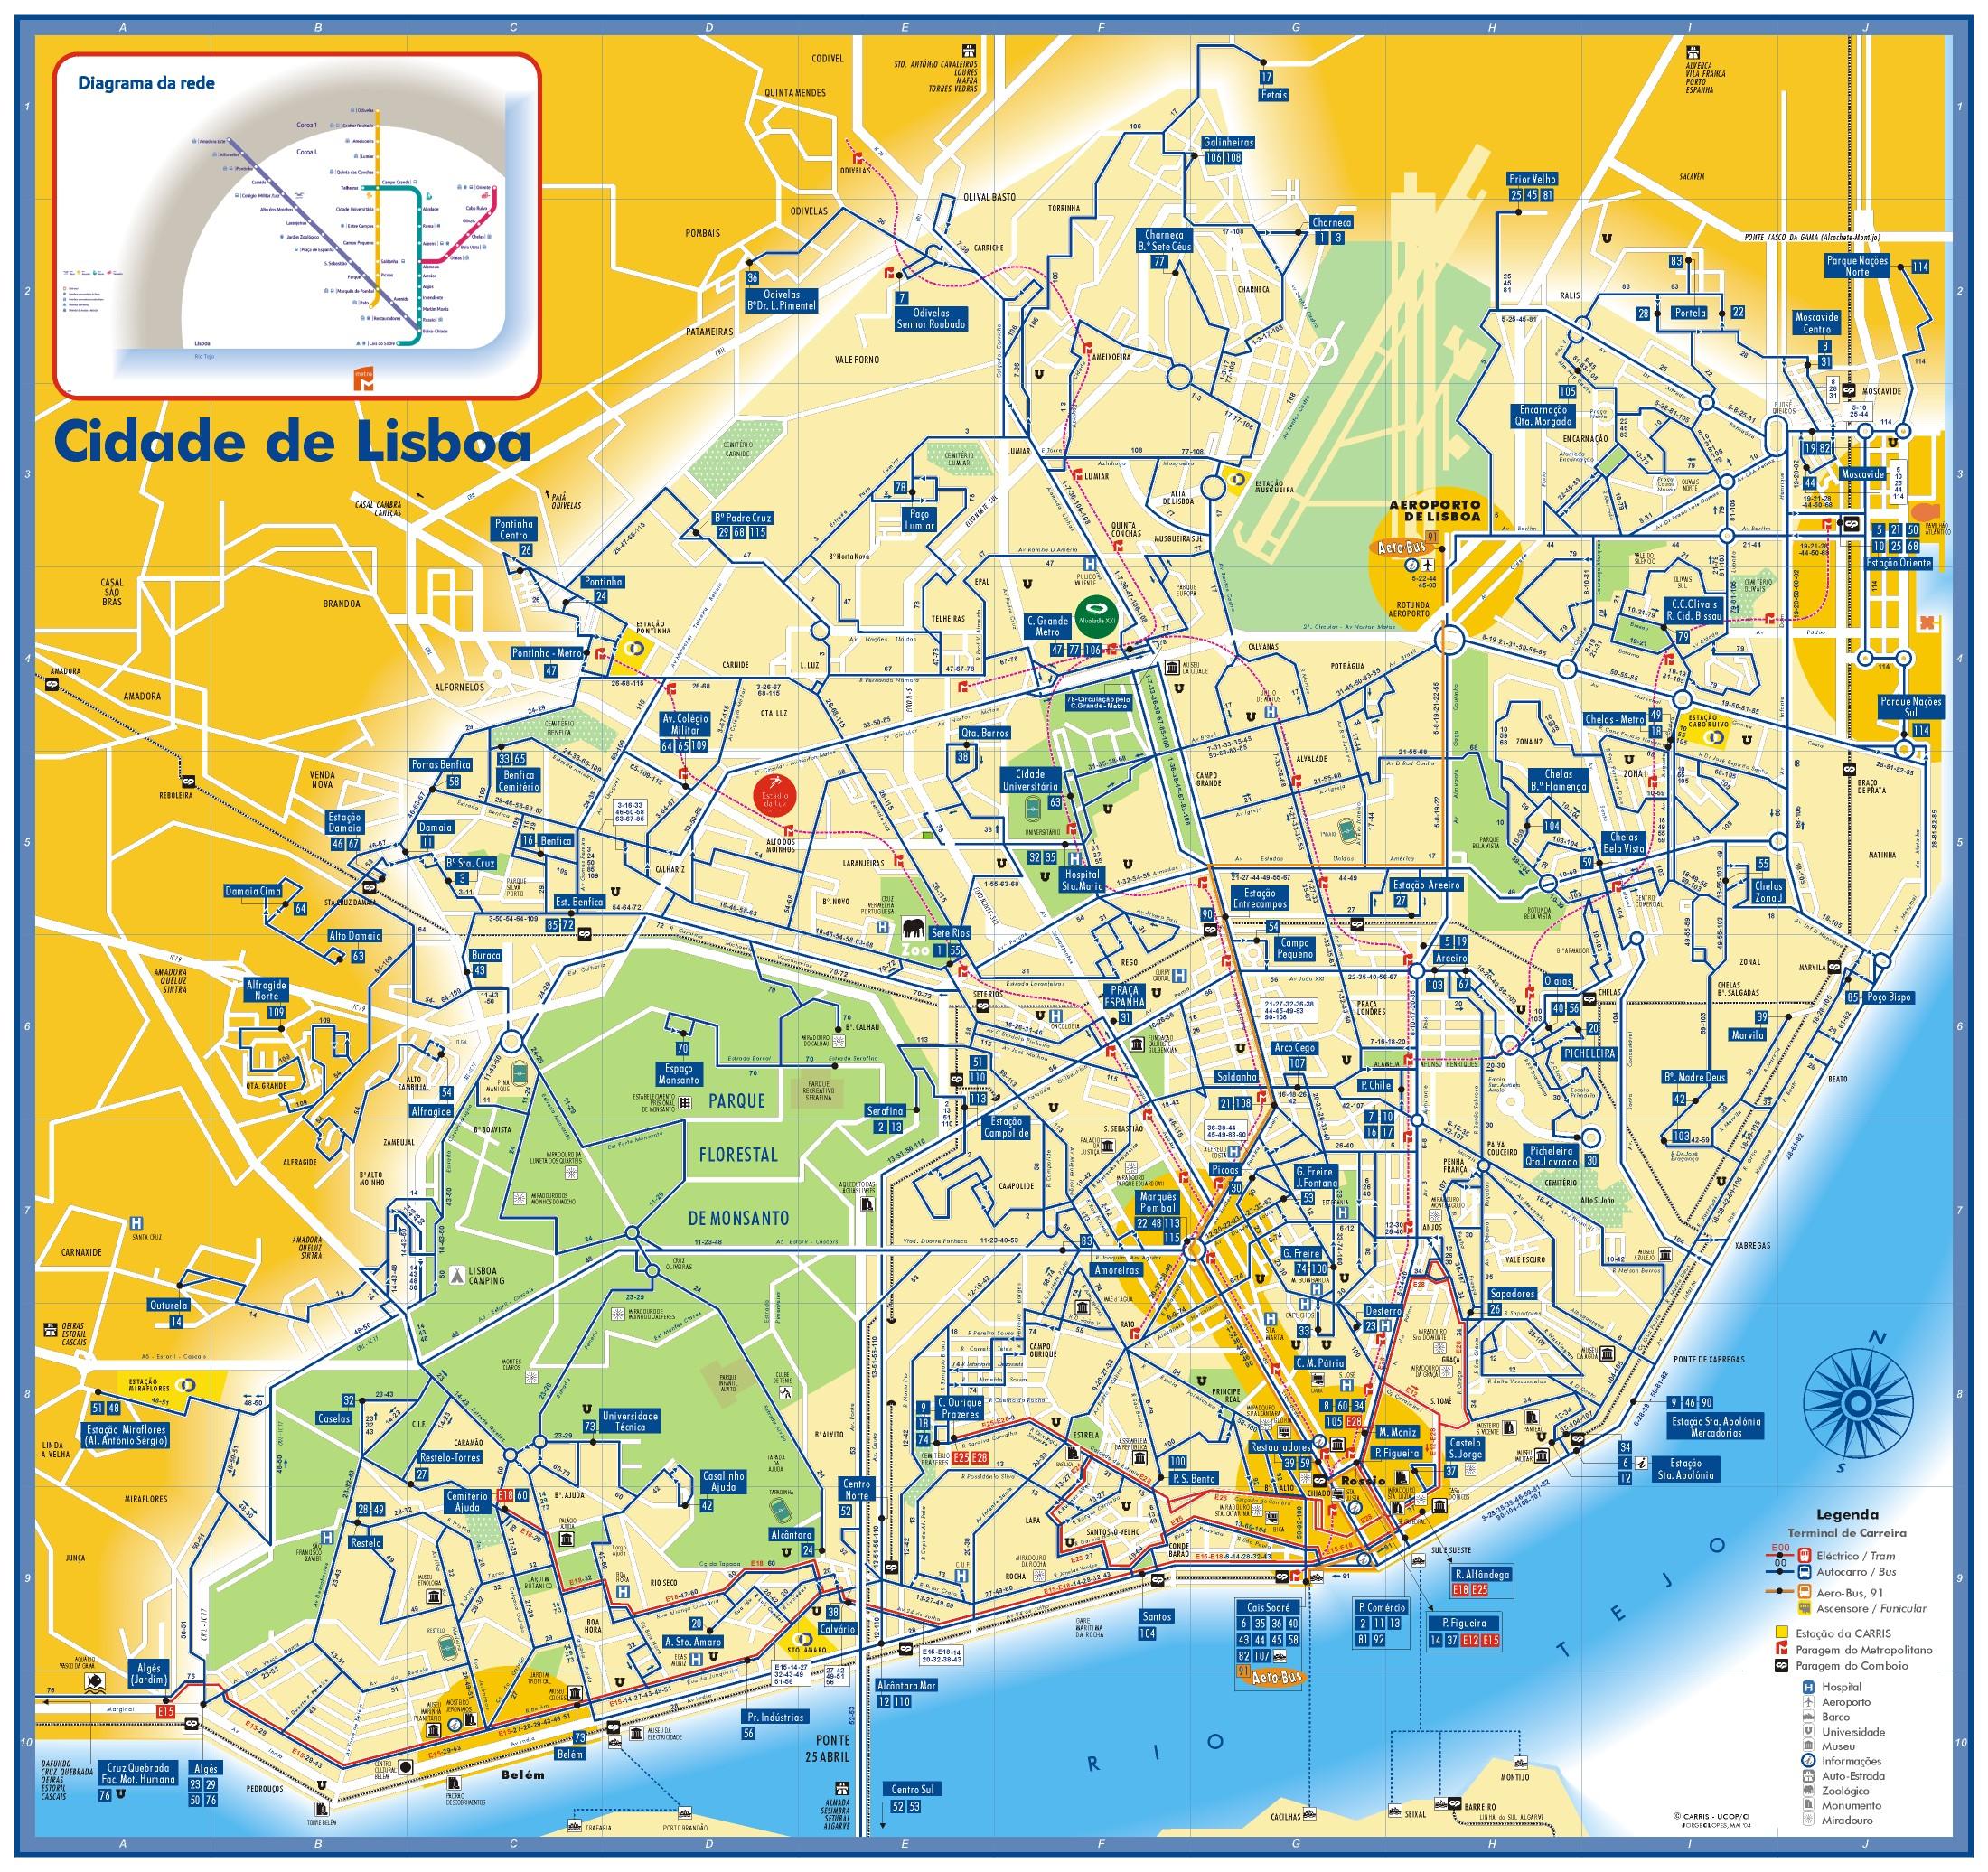 Mapa Turistico Lisboa Pdf.Mapa Turistico De Lisboa Para Imprimir Viajar Lisboa